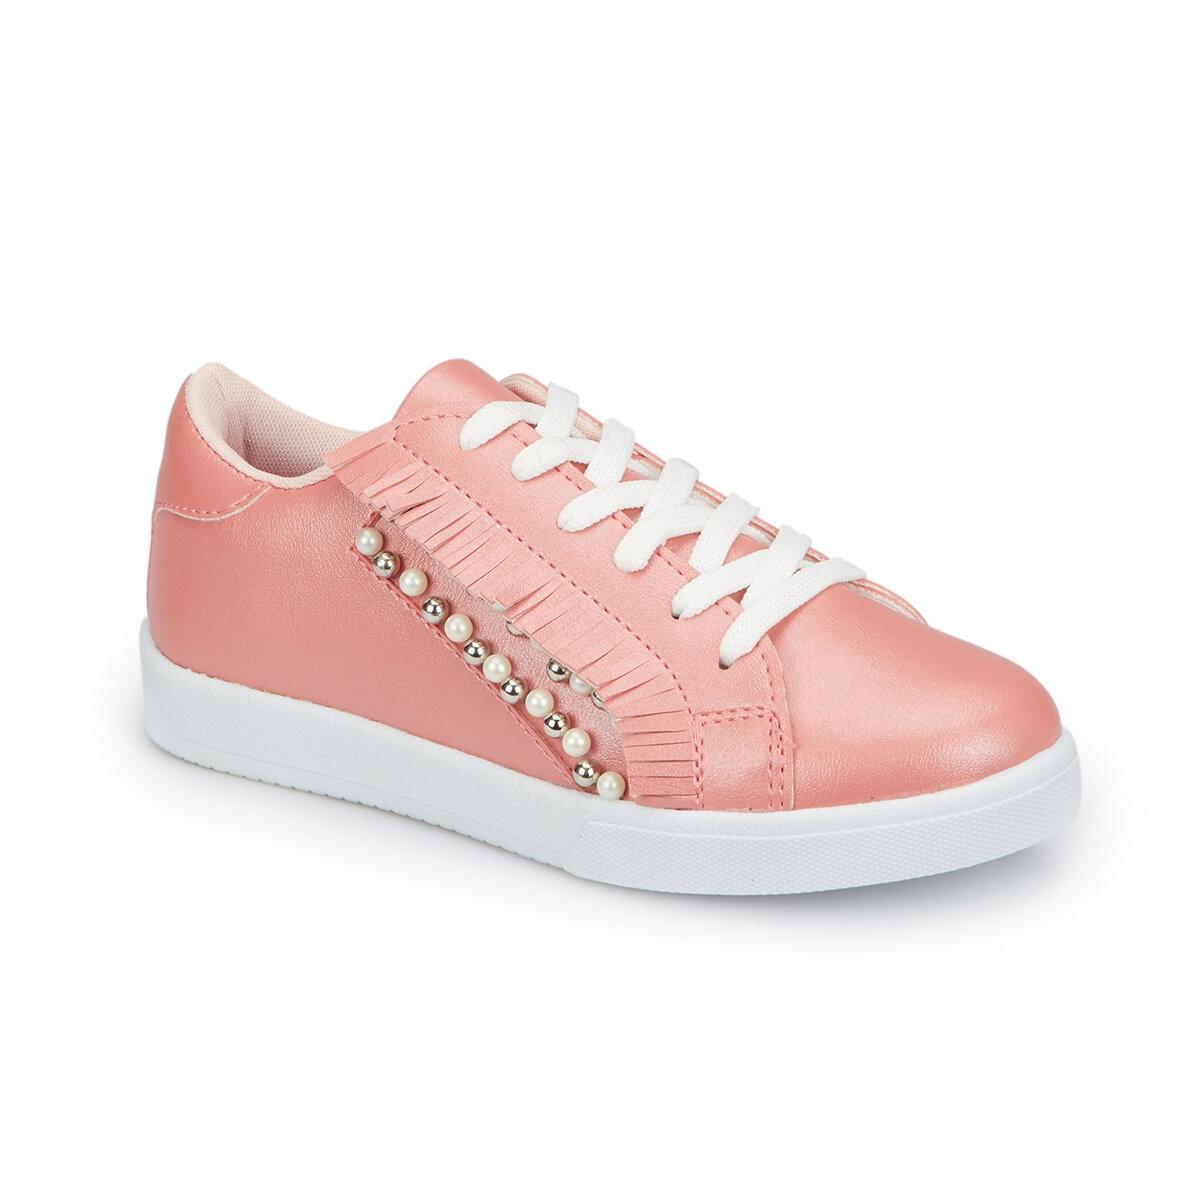 FLO 81.510058.F Coral Female Child Sneaker Shoes Polaris